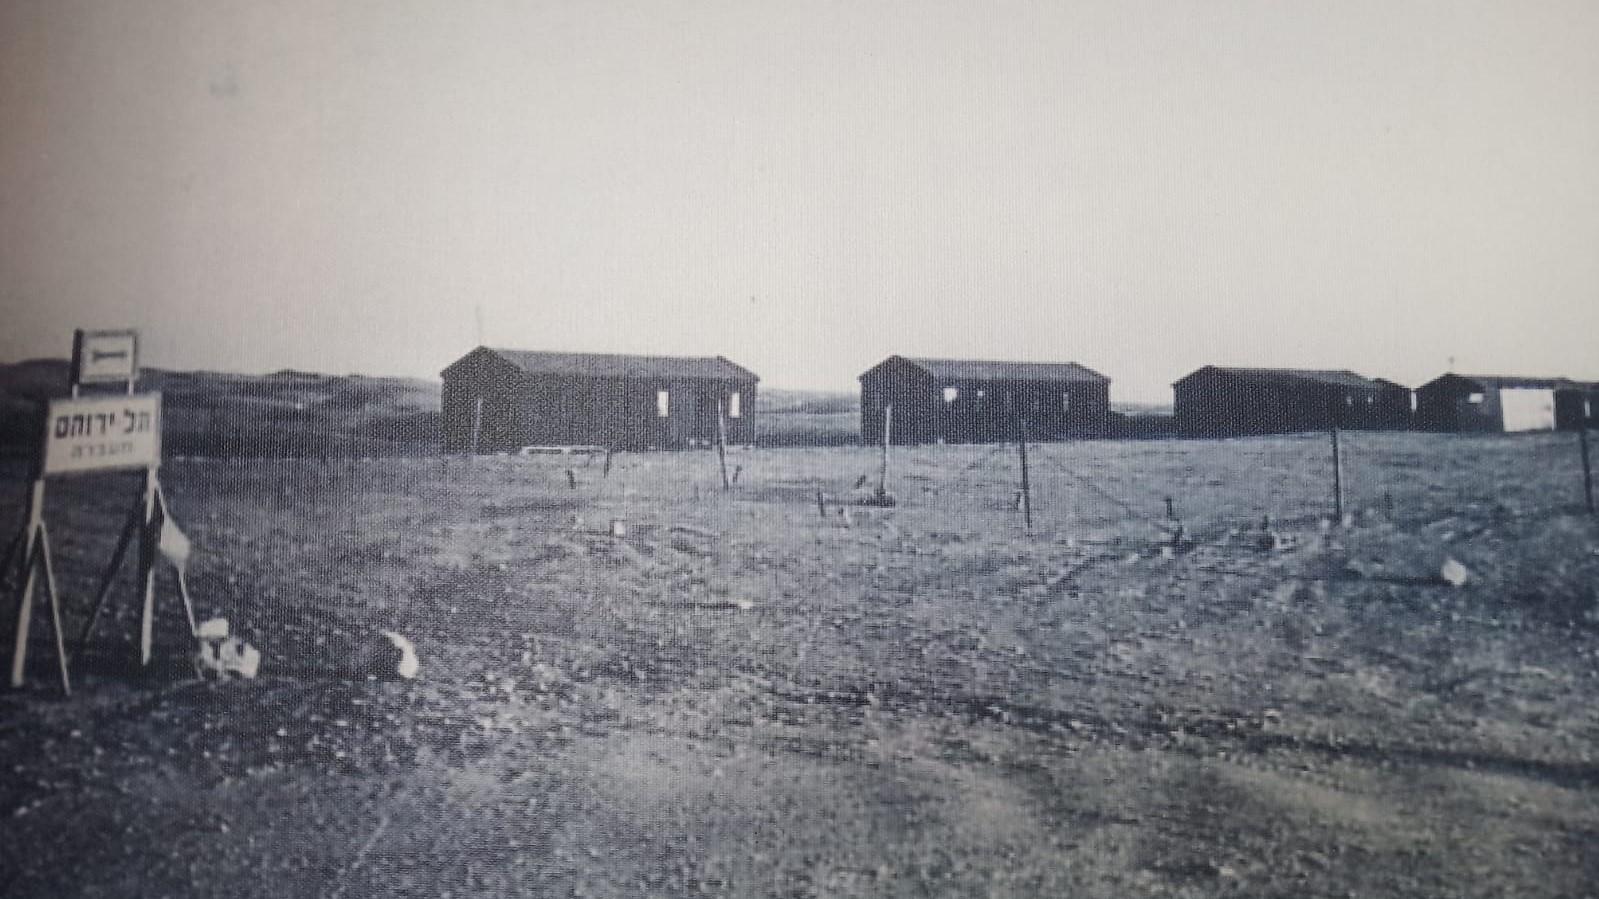 Yeru'ham, une ville sortie du désert